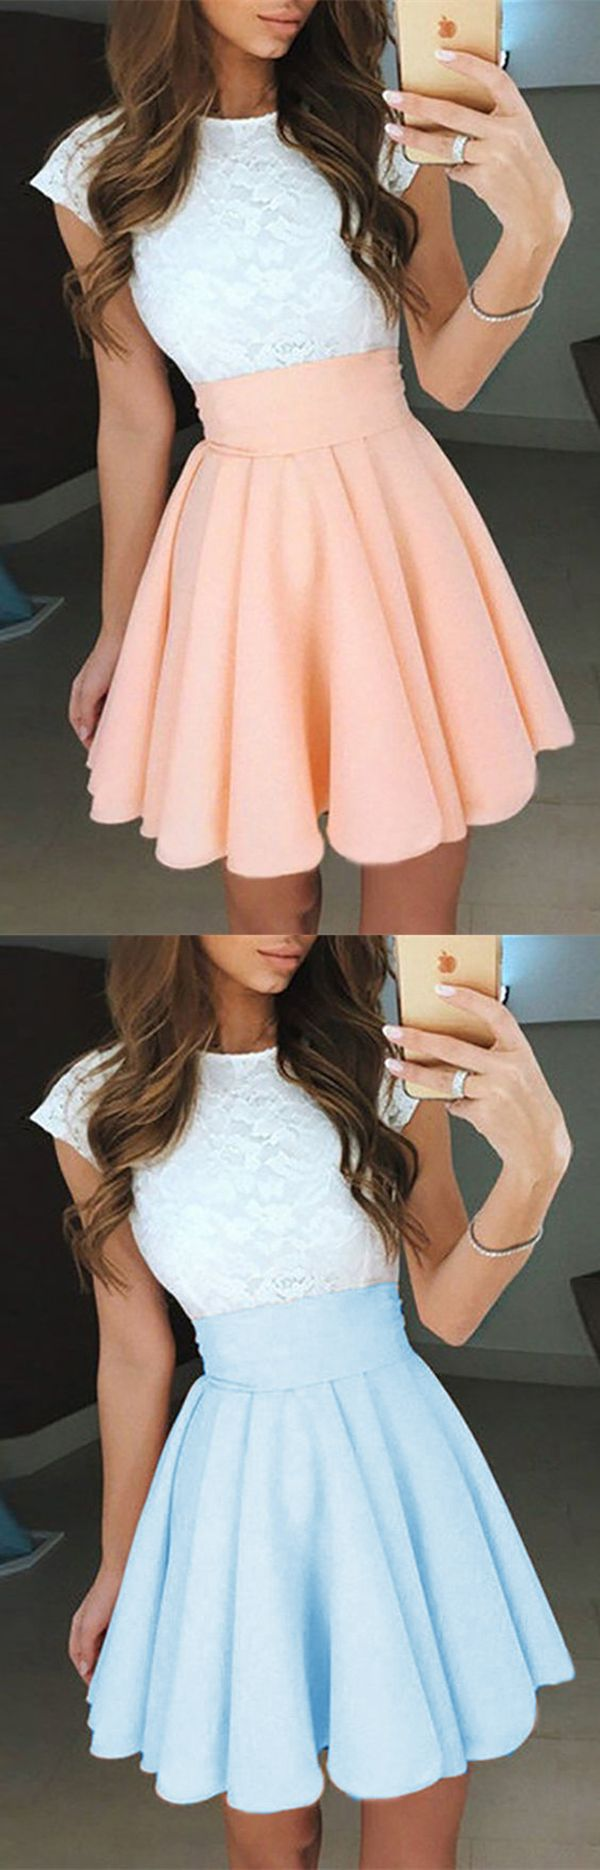 Short homecoming dressespink homecoming dresseslace homecoming